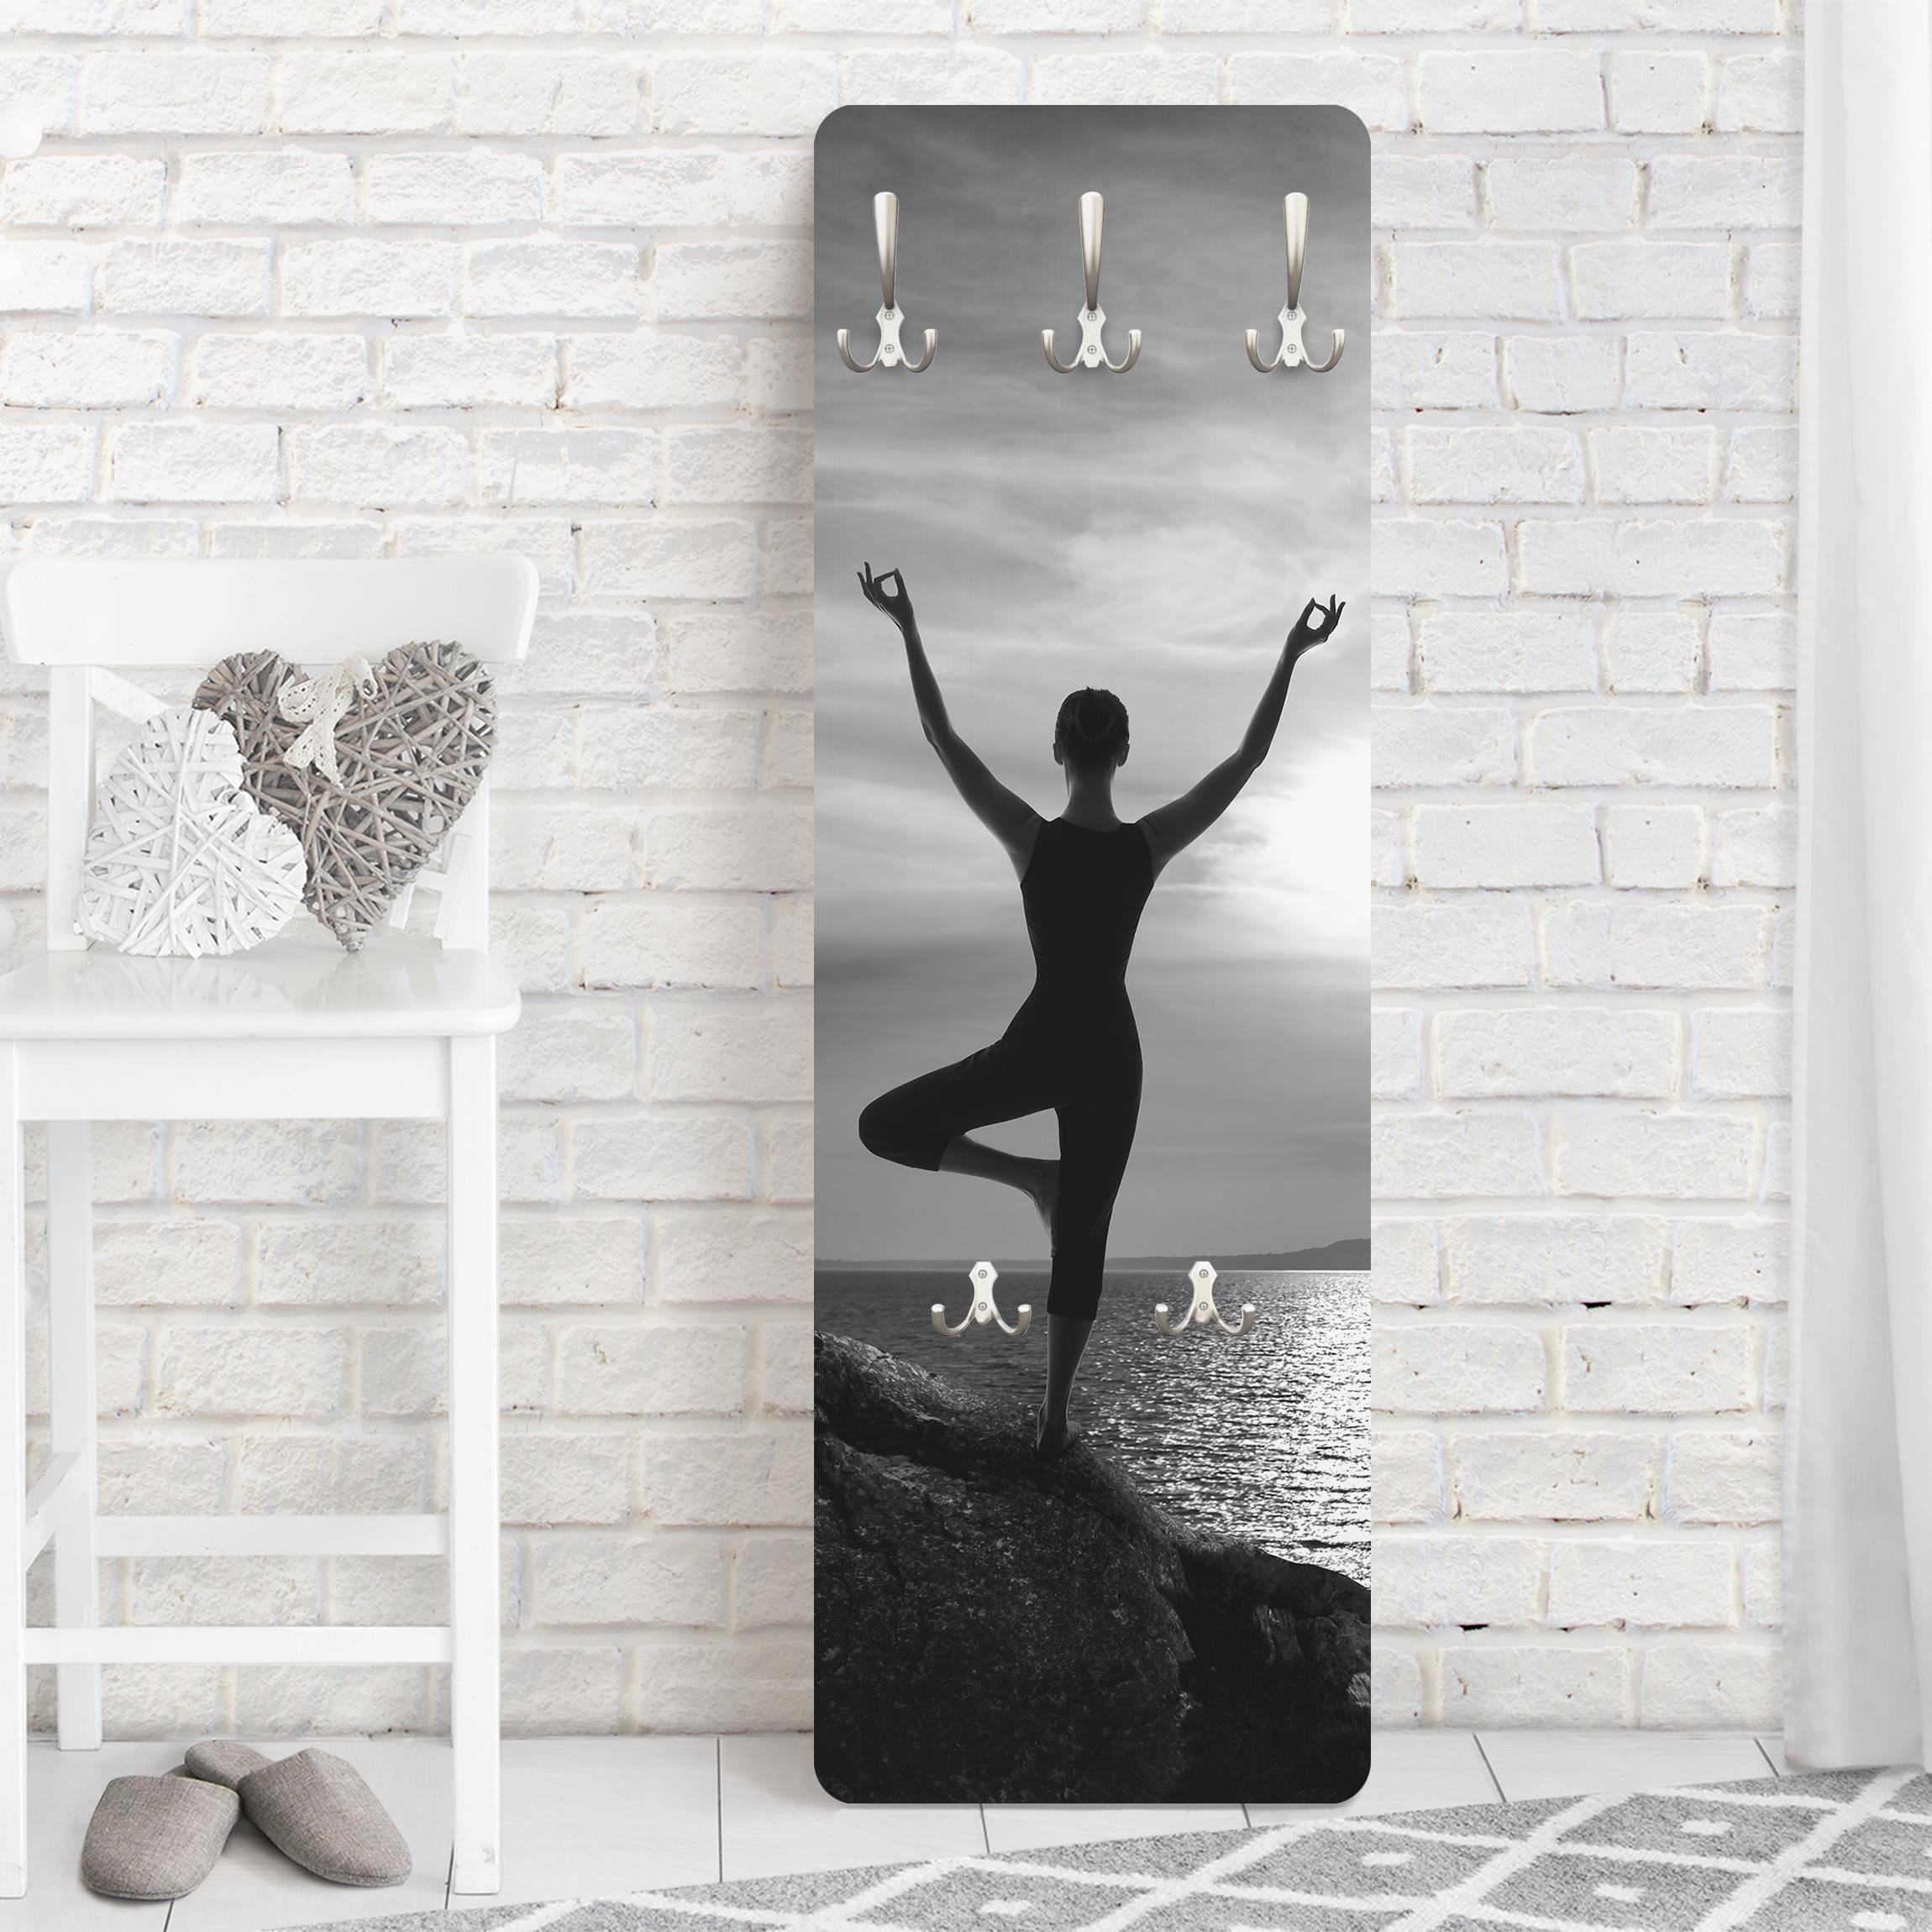 garderobe yoga schwarz weiss. Black Bedroom Furniture Sets. Home Design Ideas